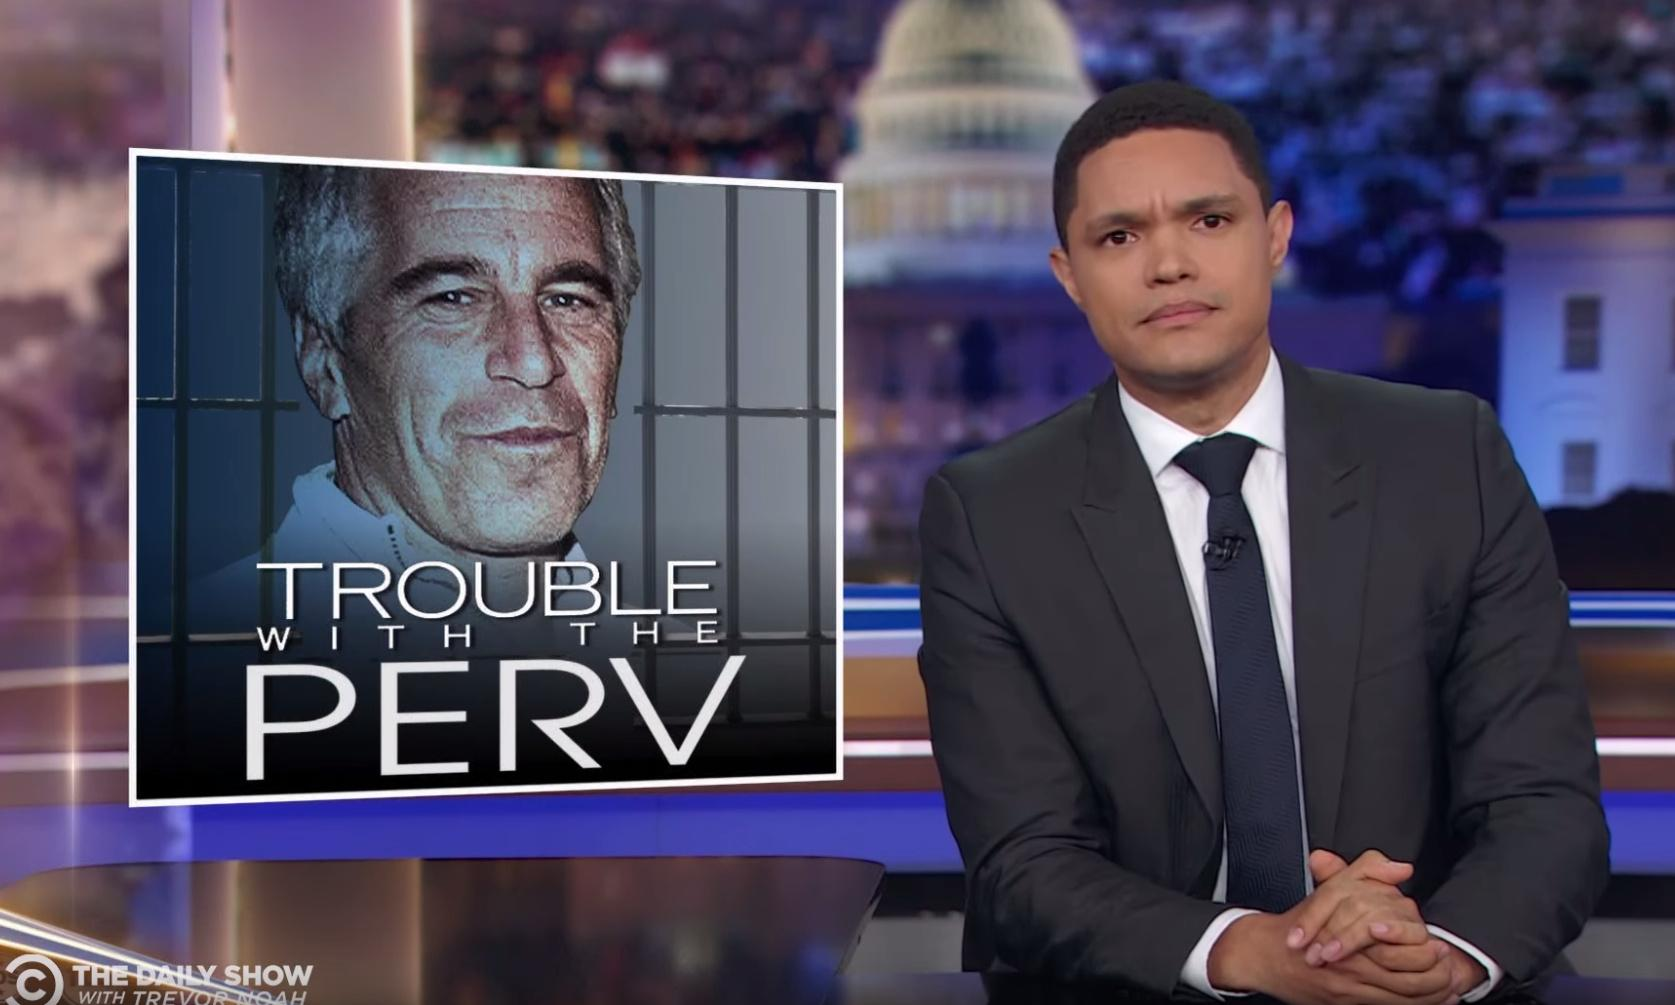 Trevor Noah: Jeffrey Epstein's plea deal 'was the conspiracy'